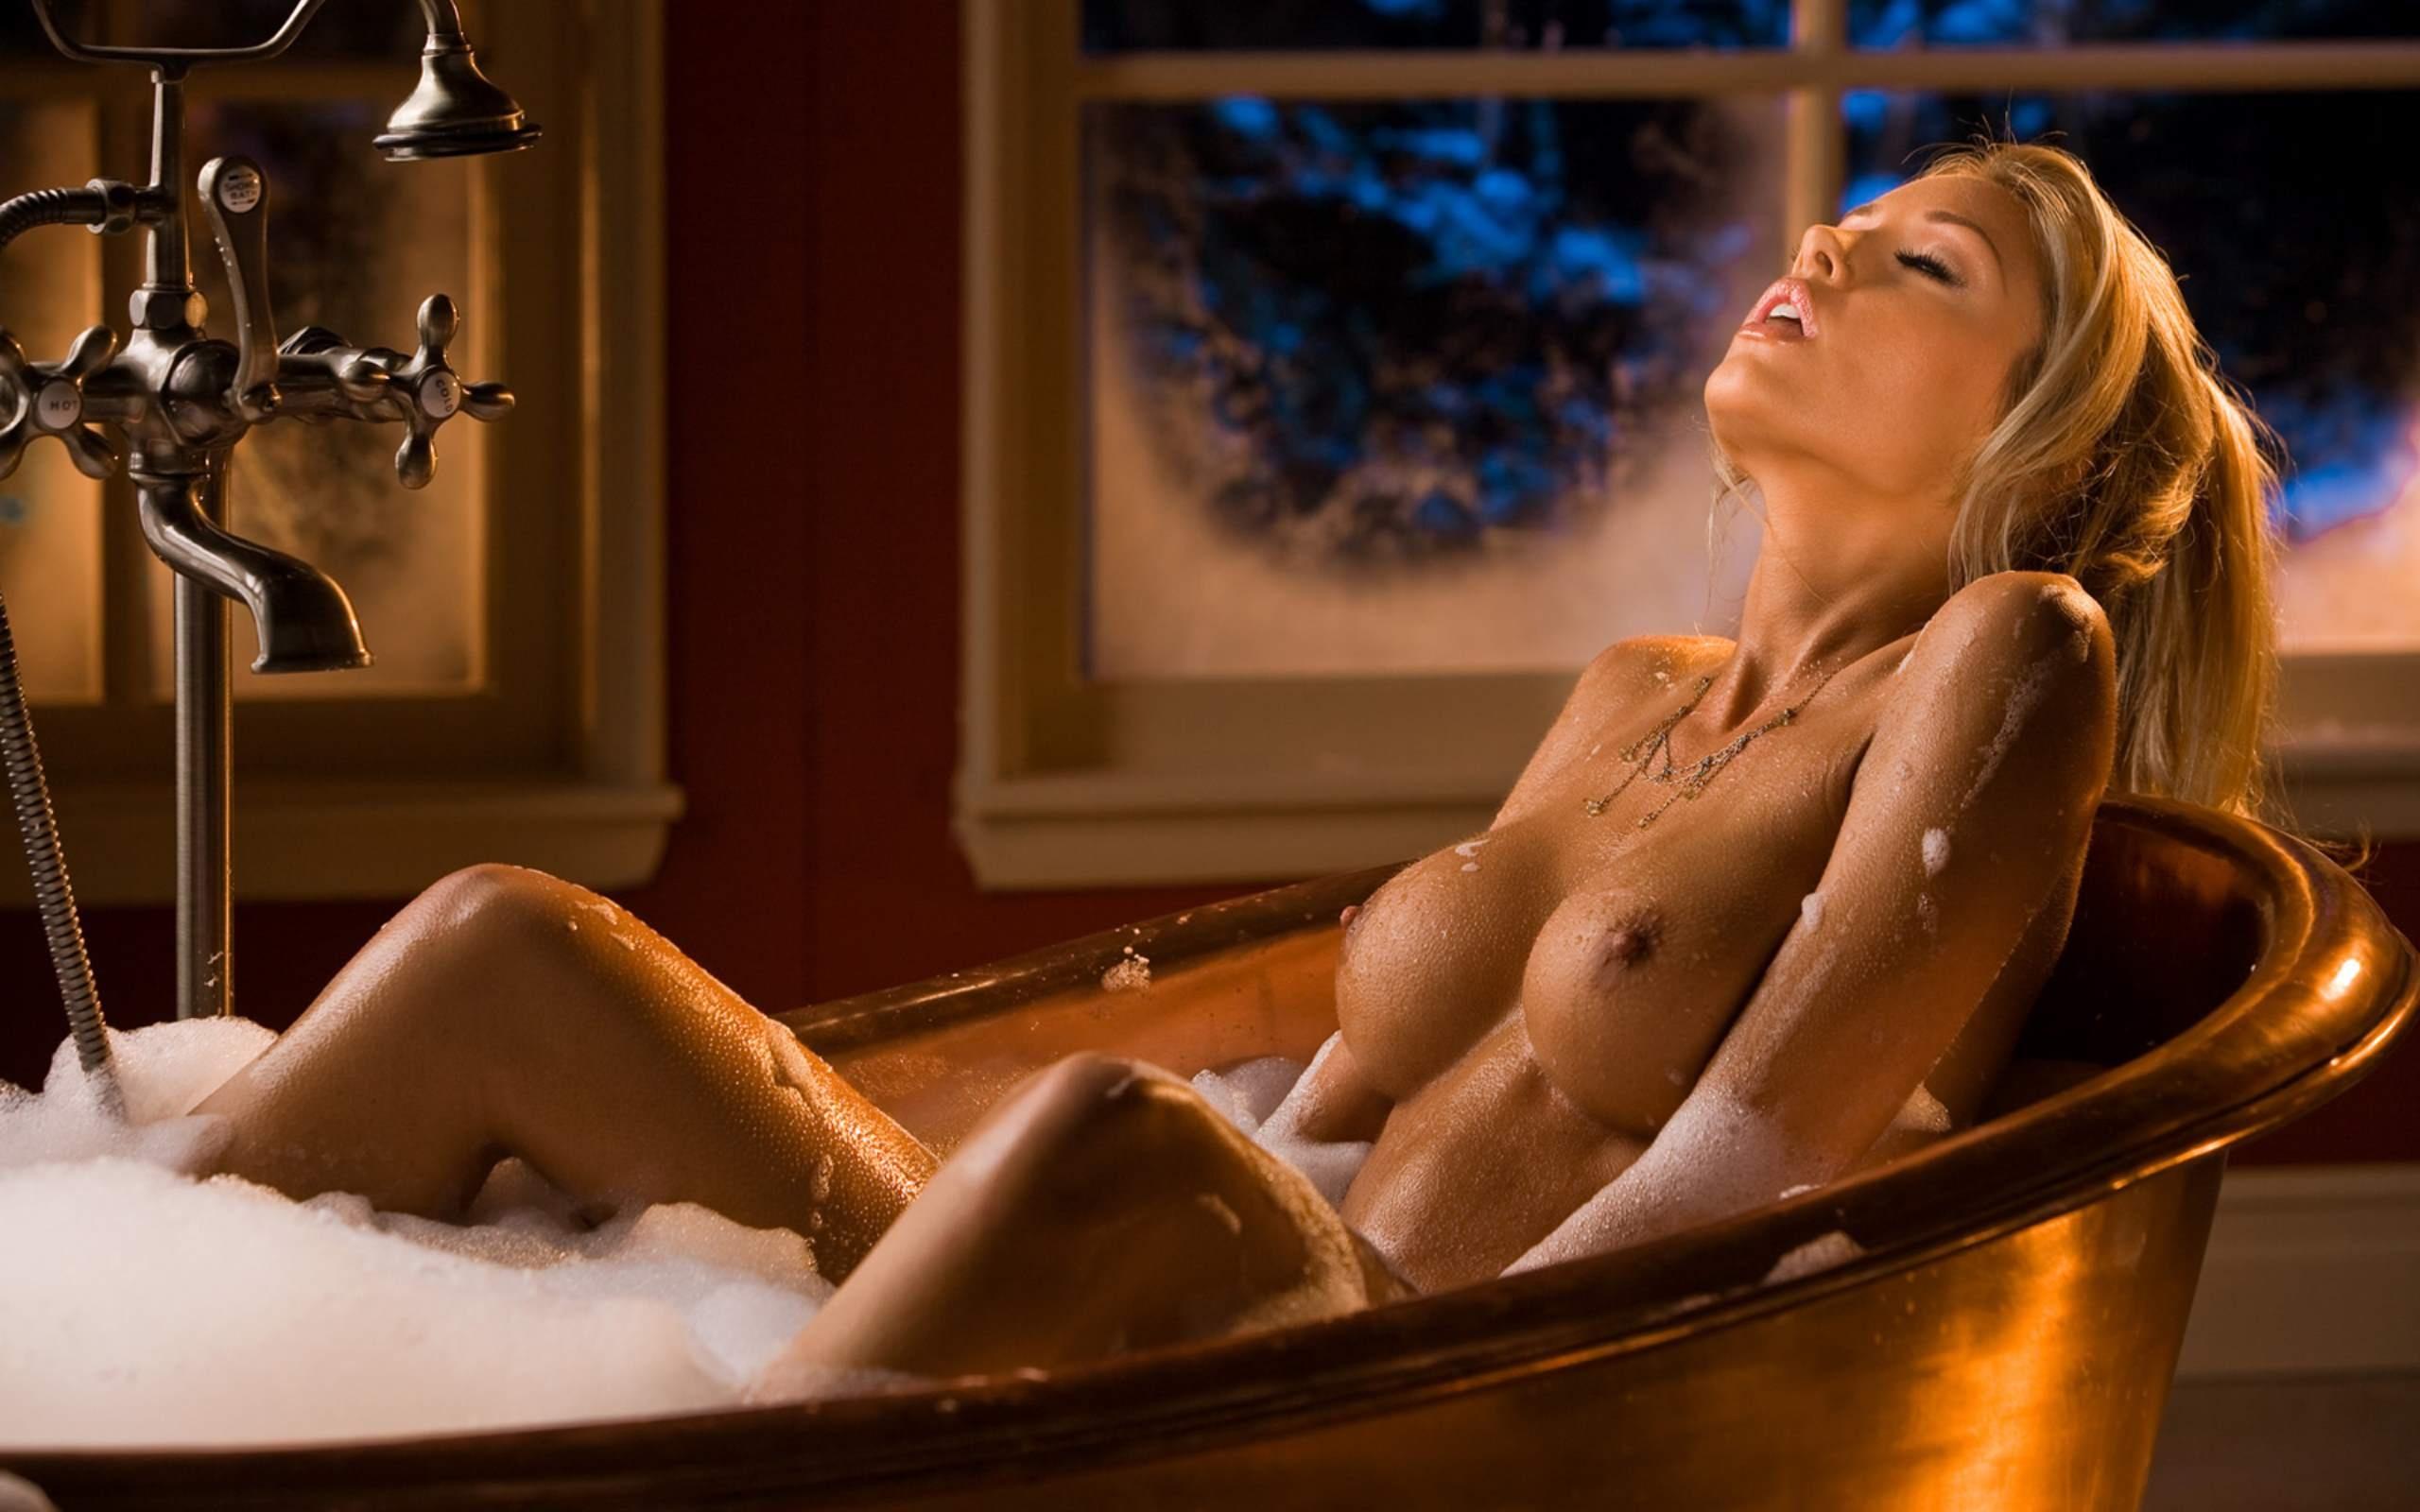 Rae nude heather ass hot